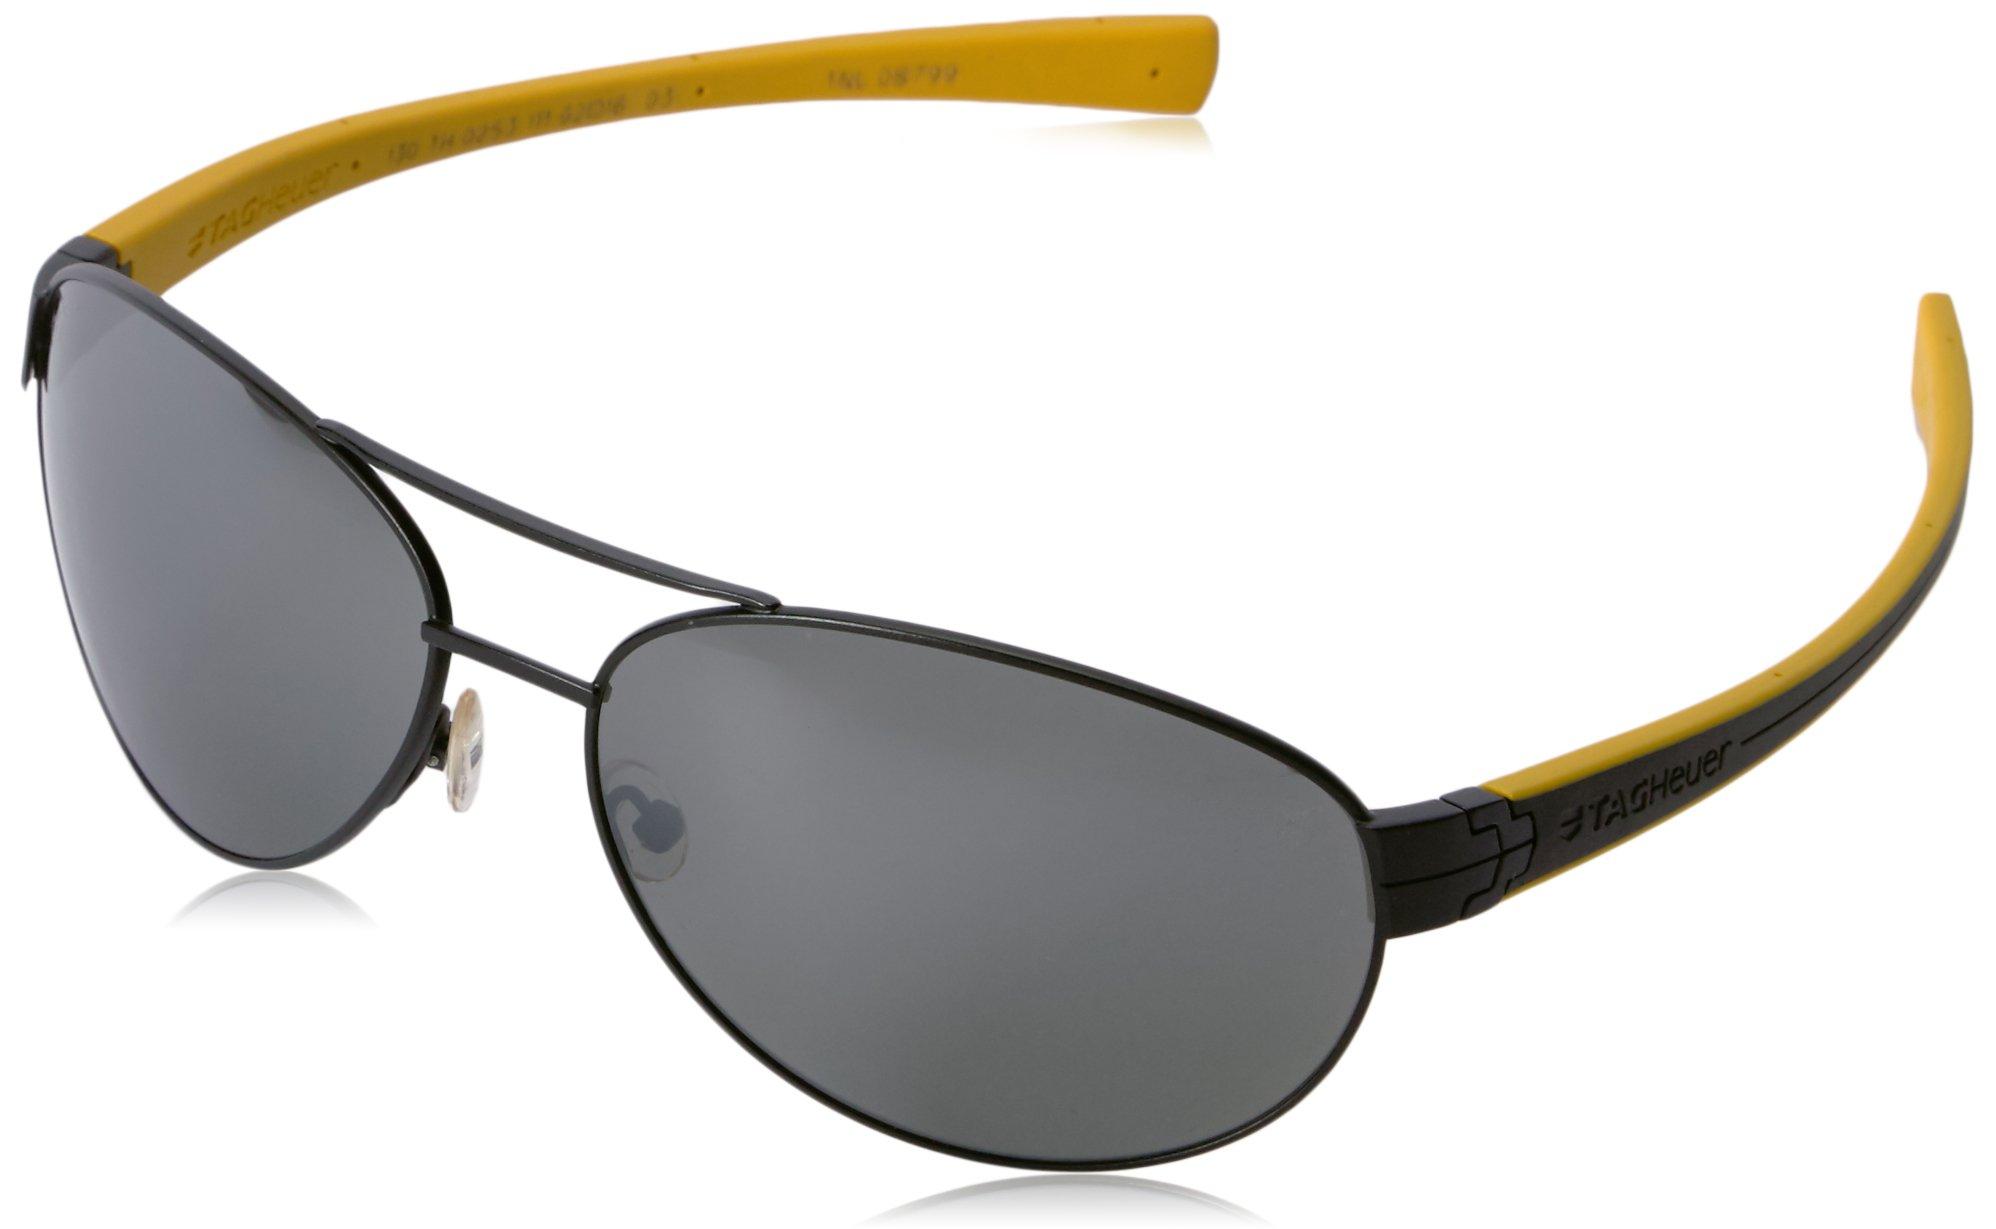 02c24e3bfbf6d TAG HEUER 66 0253 111 621603 Polarized Oval Sunglasses BLACK 62 mm